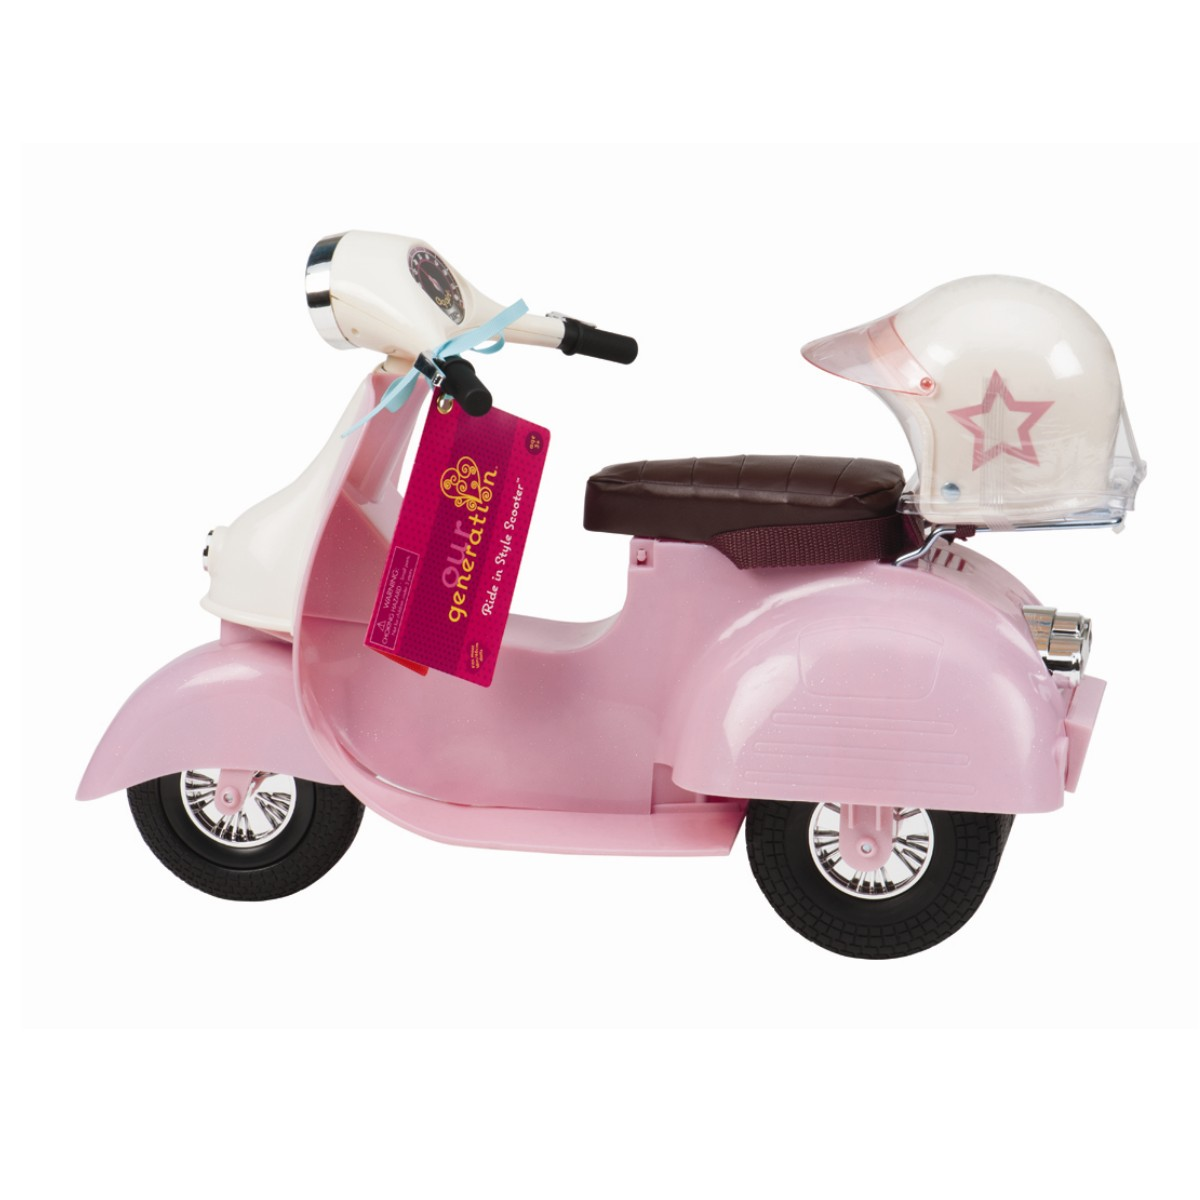 Our Generation - Pinker Roller (737131)